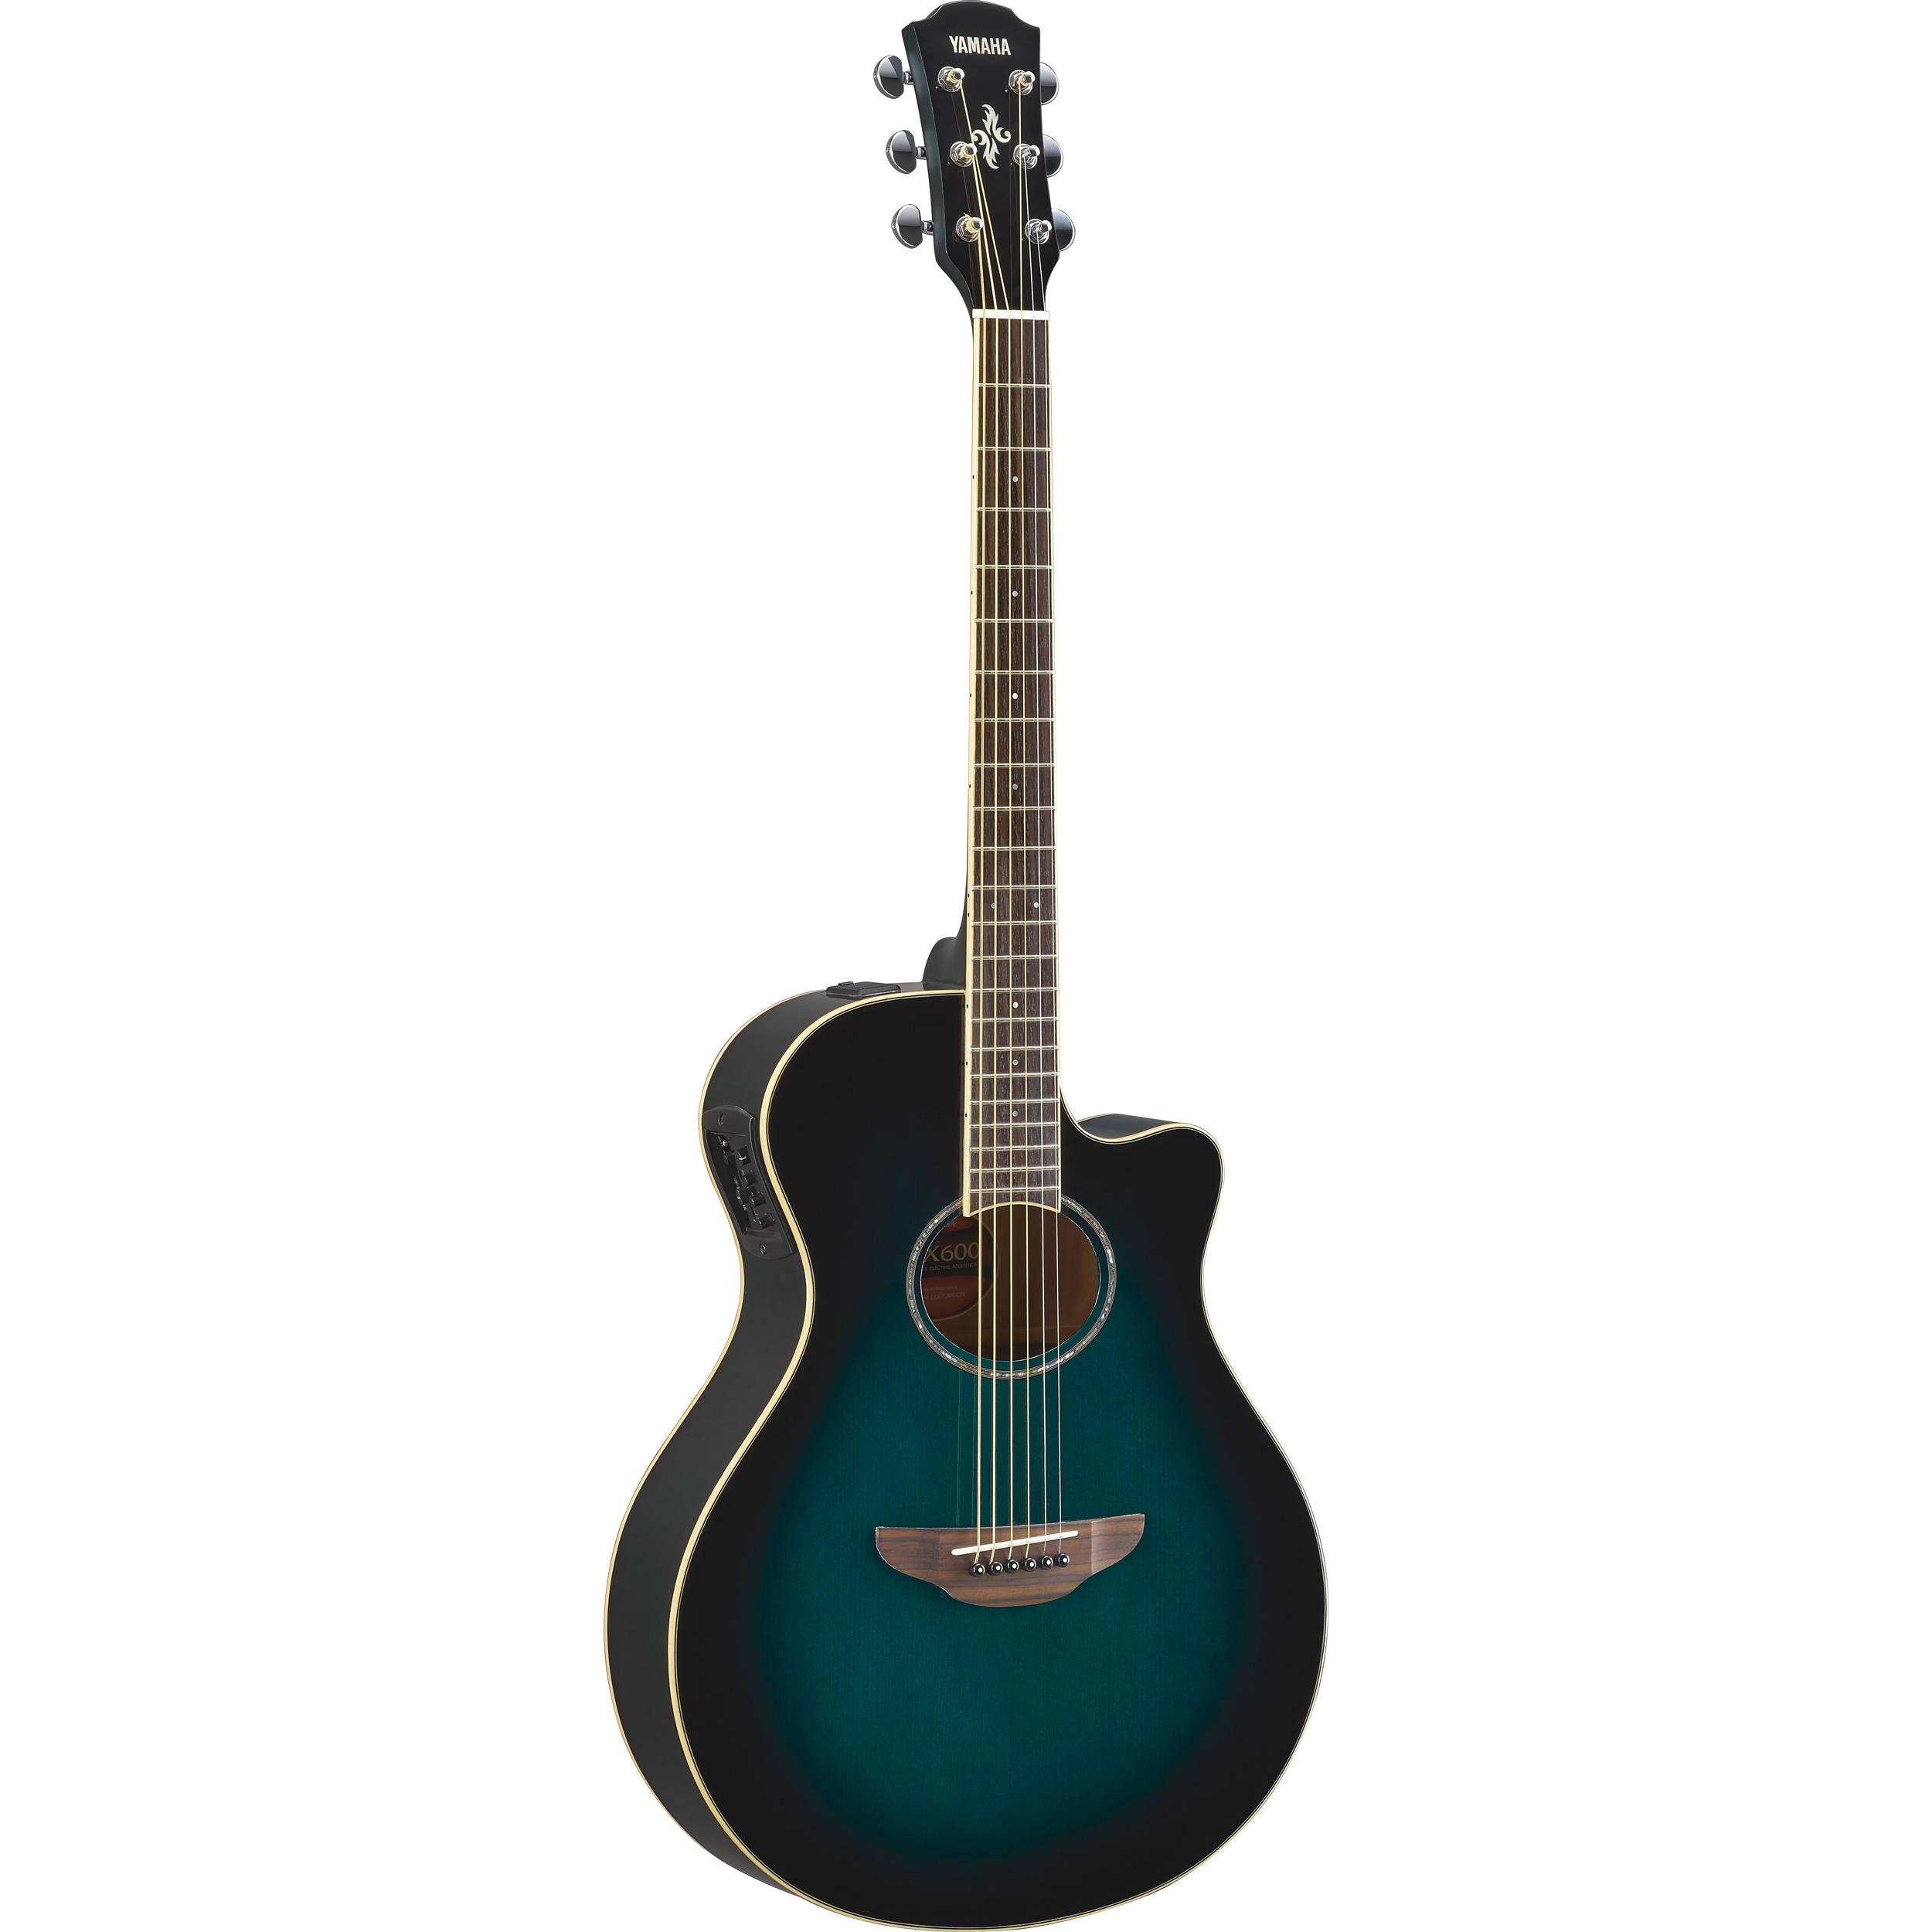 Guitars & Basses Yamaha Acoustic Guitar Apx600 Obb Oriental Blue Burst From Japan